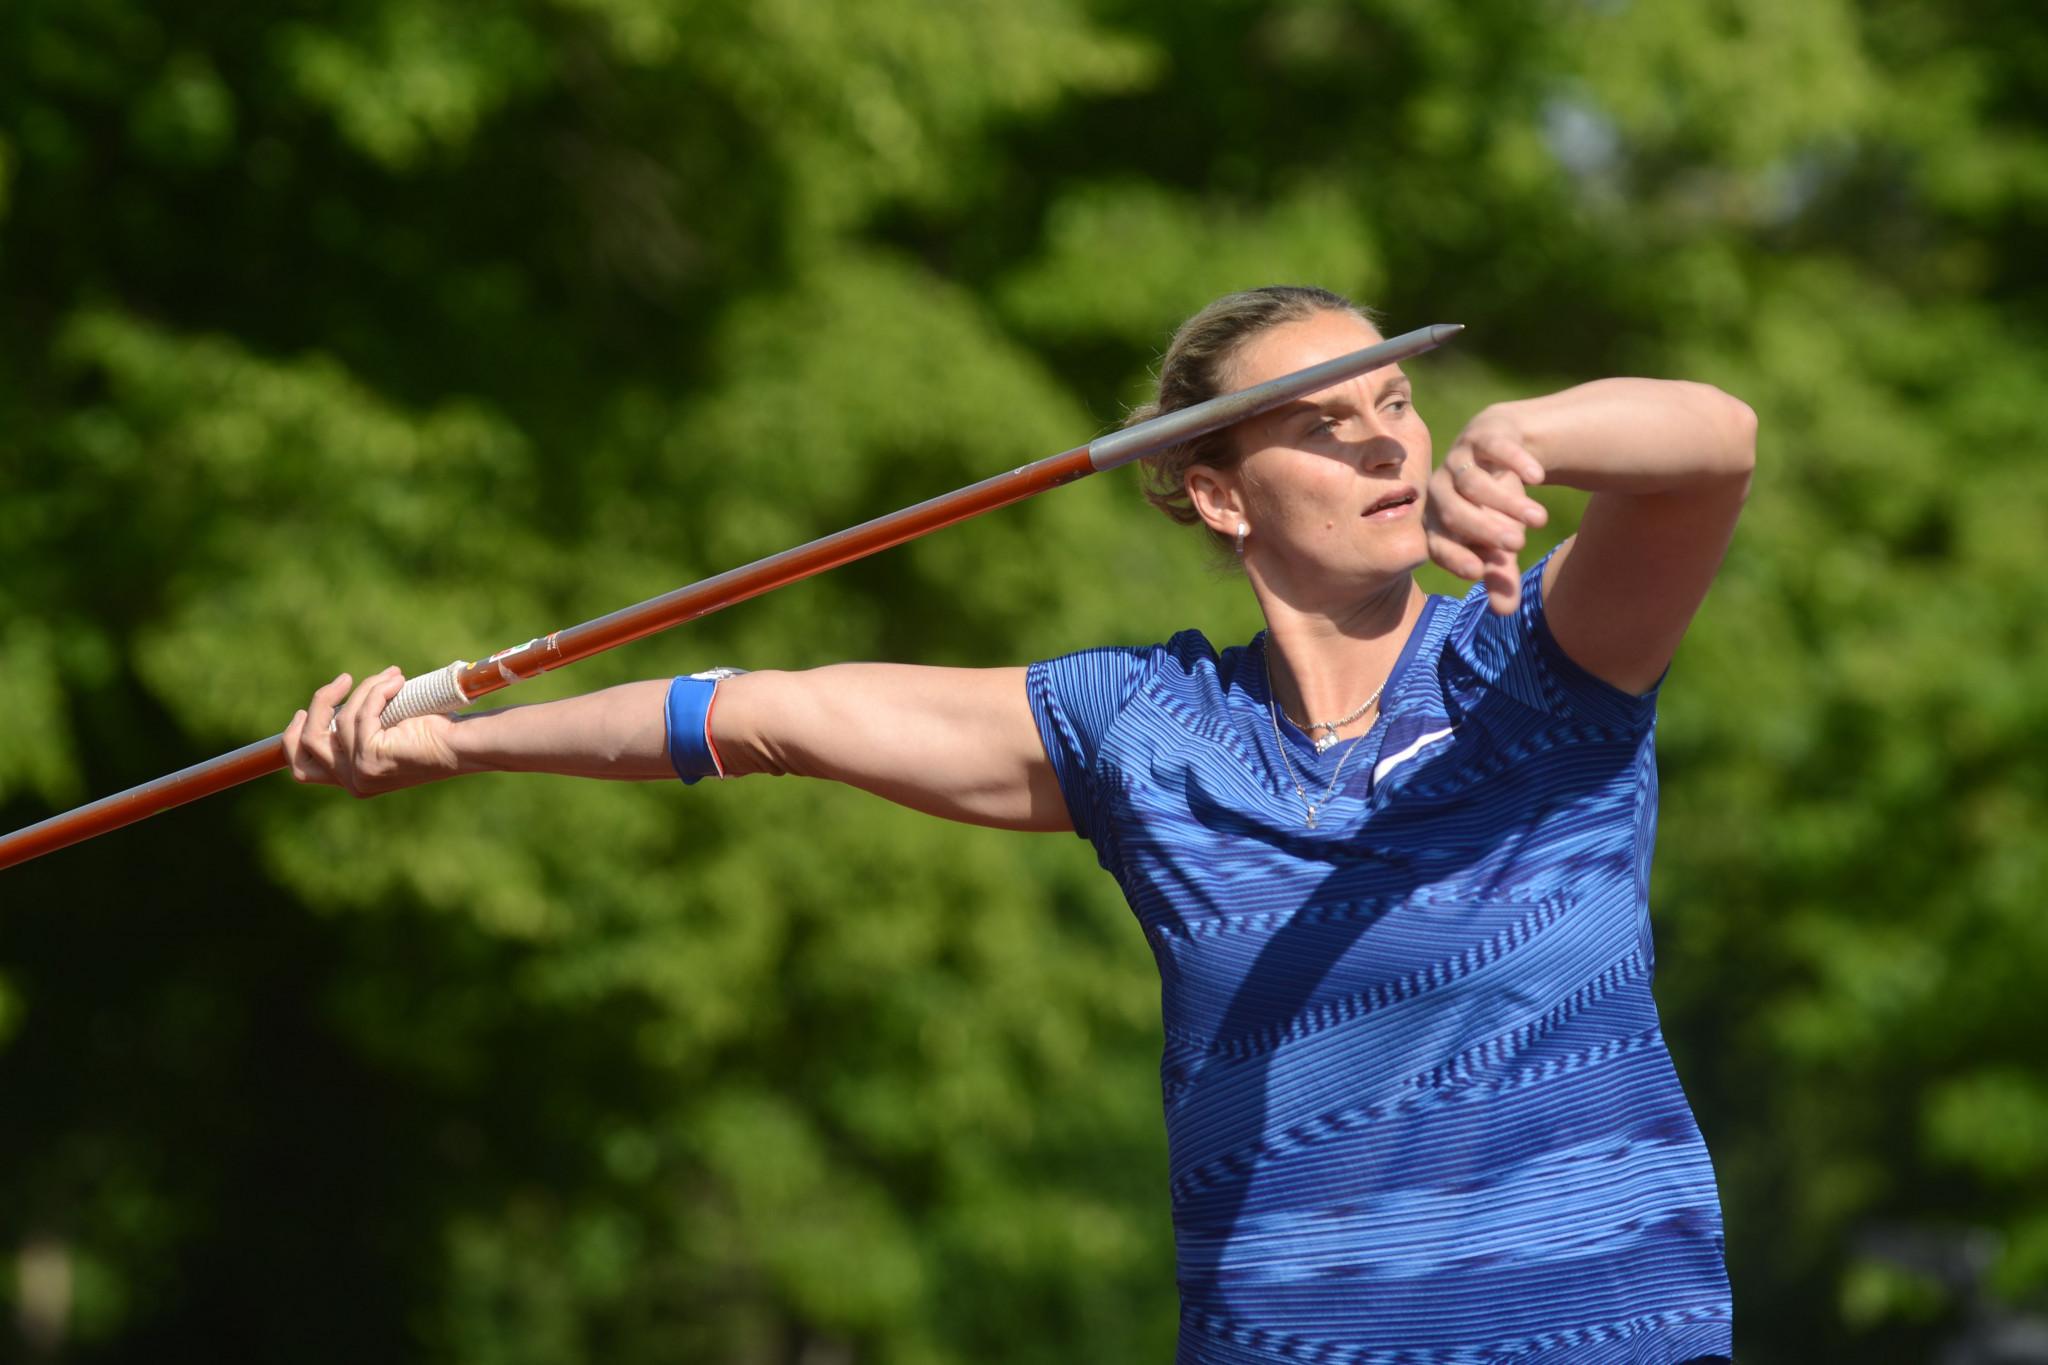 Spotakova eyes Tokyo 2020 after Czech Athletics Federation hold first Back on the Track event